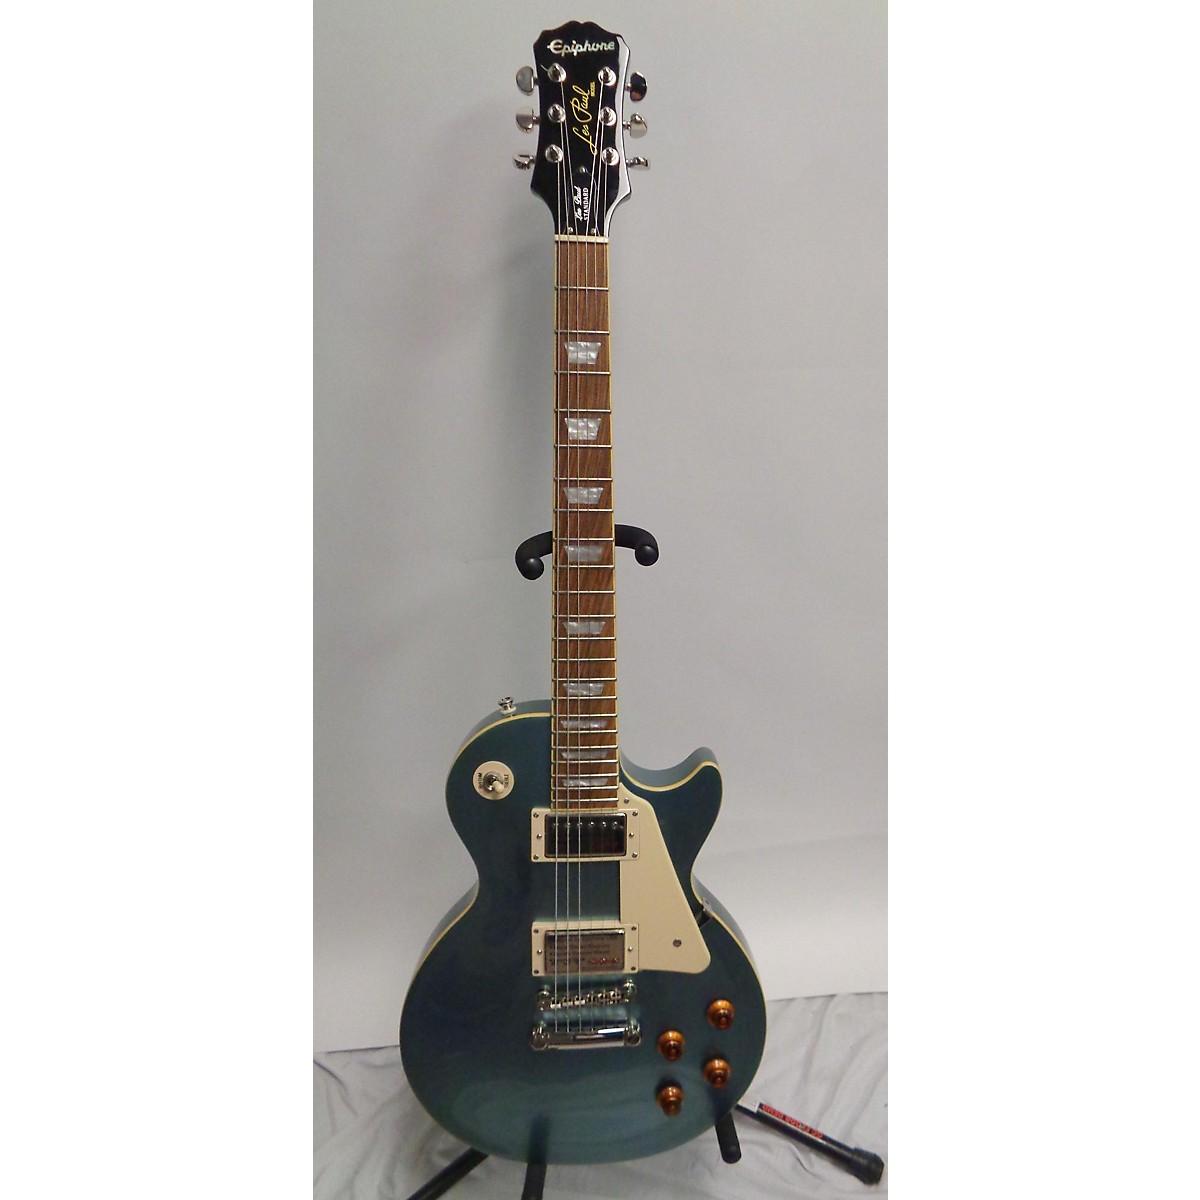 Epiphone 2019 Les Paul Standard Solid Body Electric Guitar